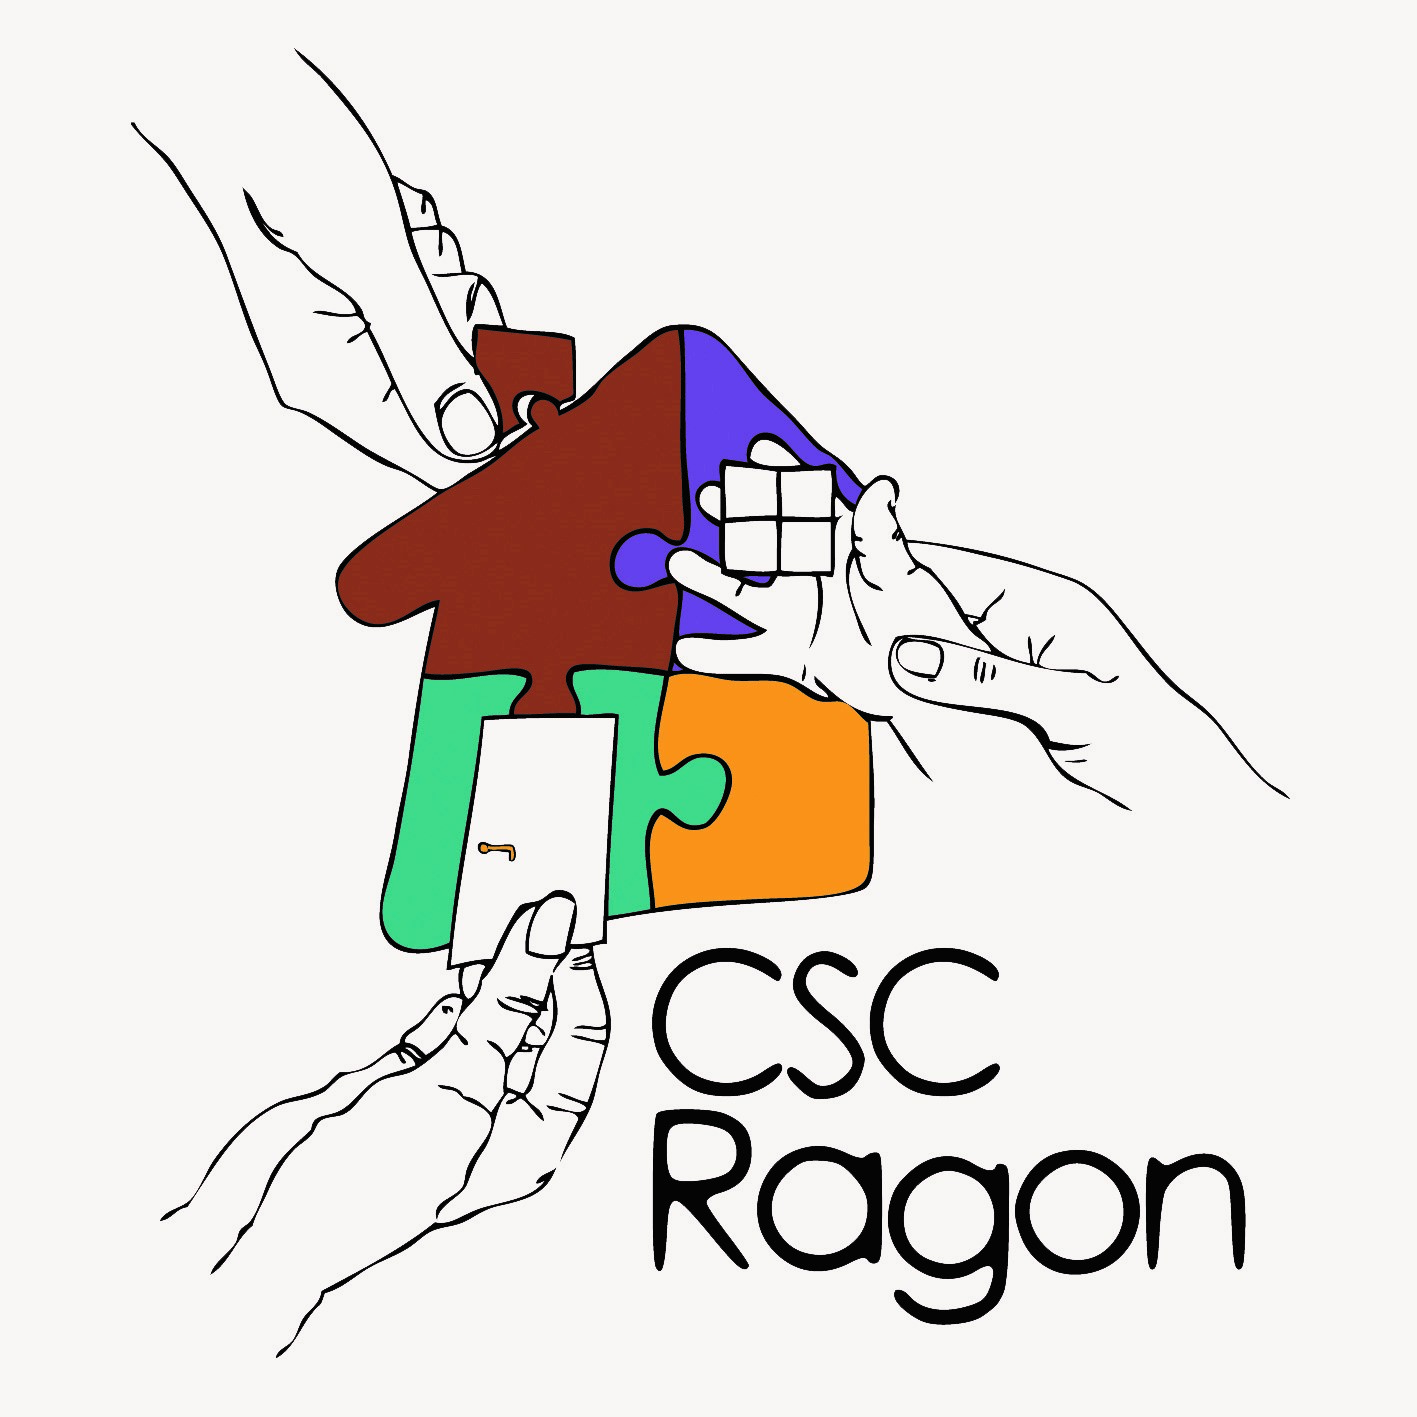 CSC (Centre Socioculturel) Ragon